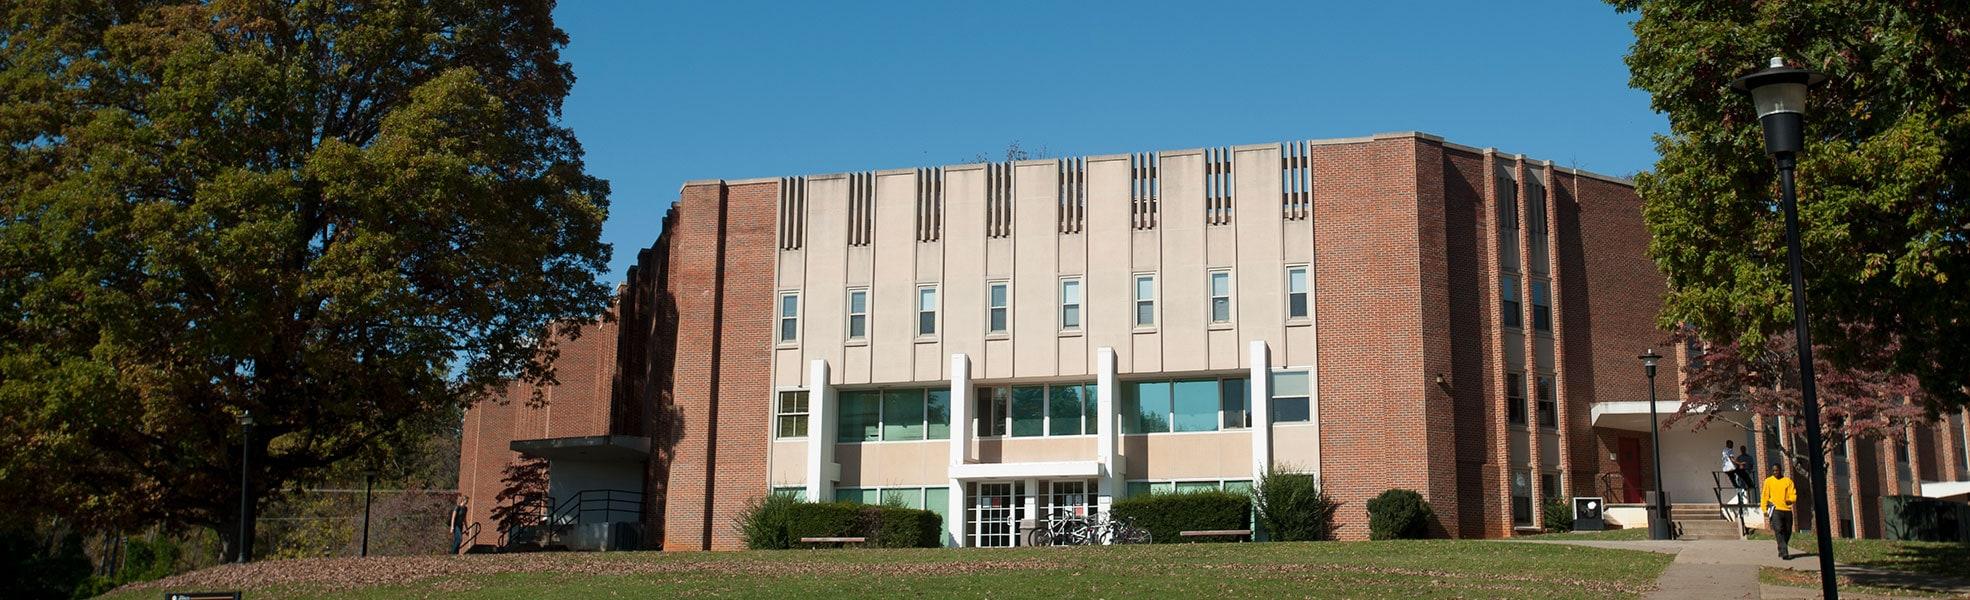 Bassett Hall at Ferrum College